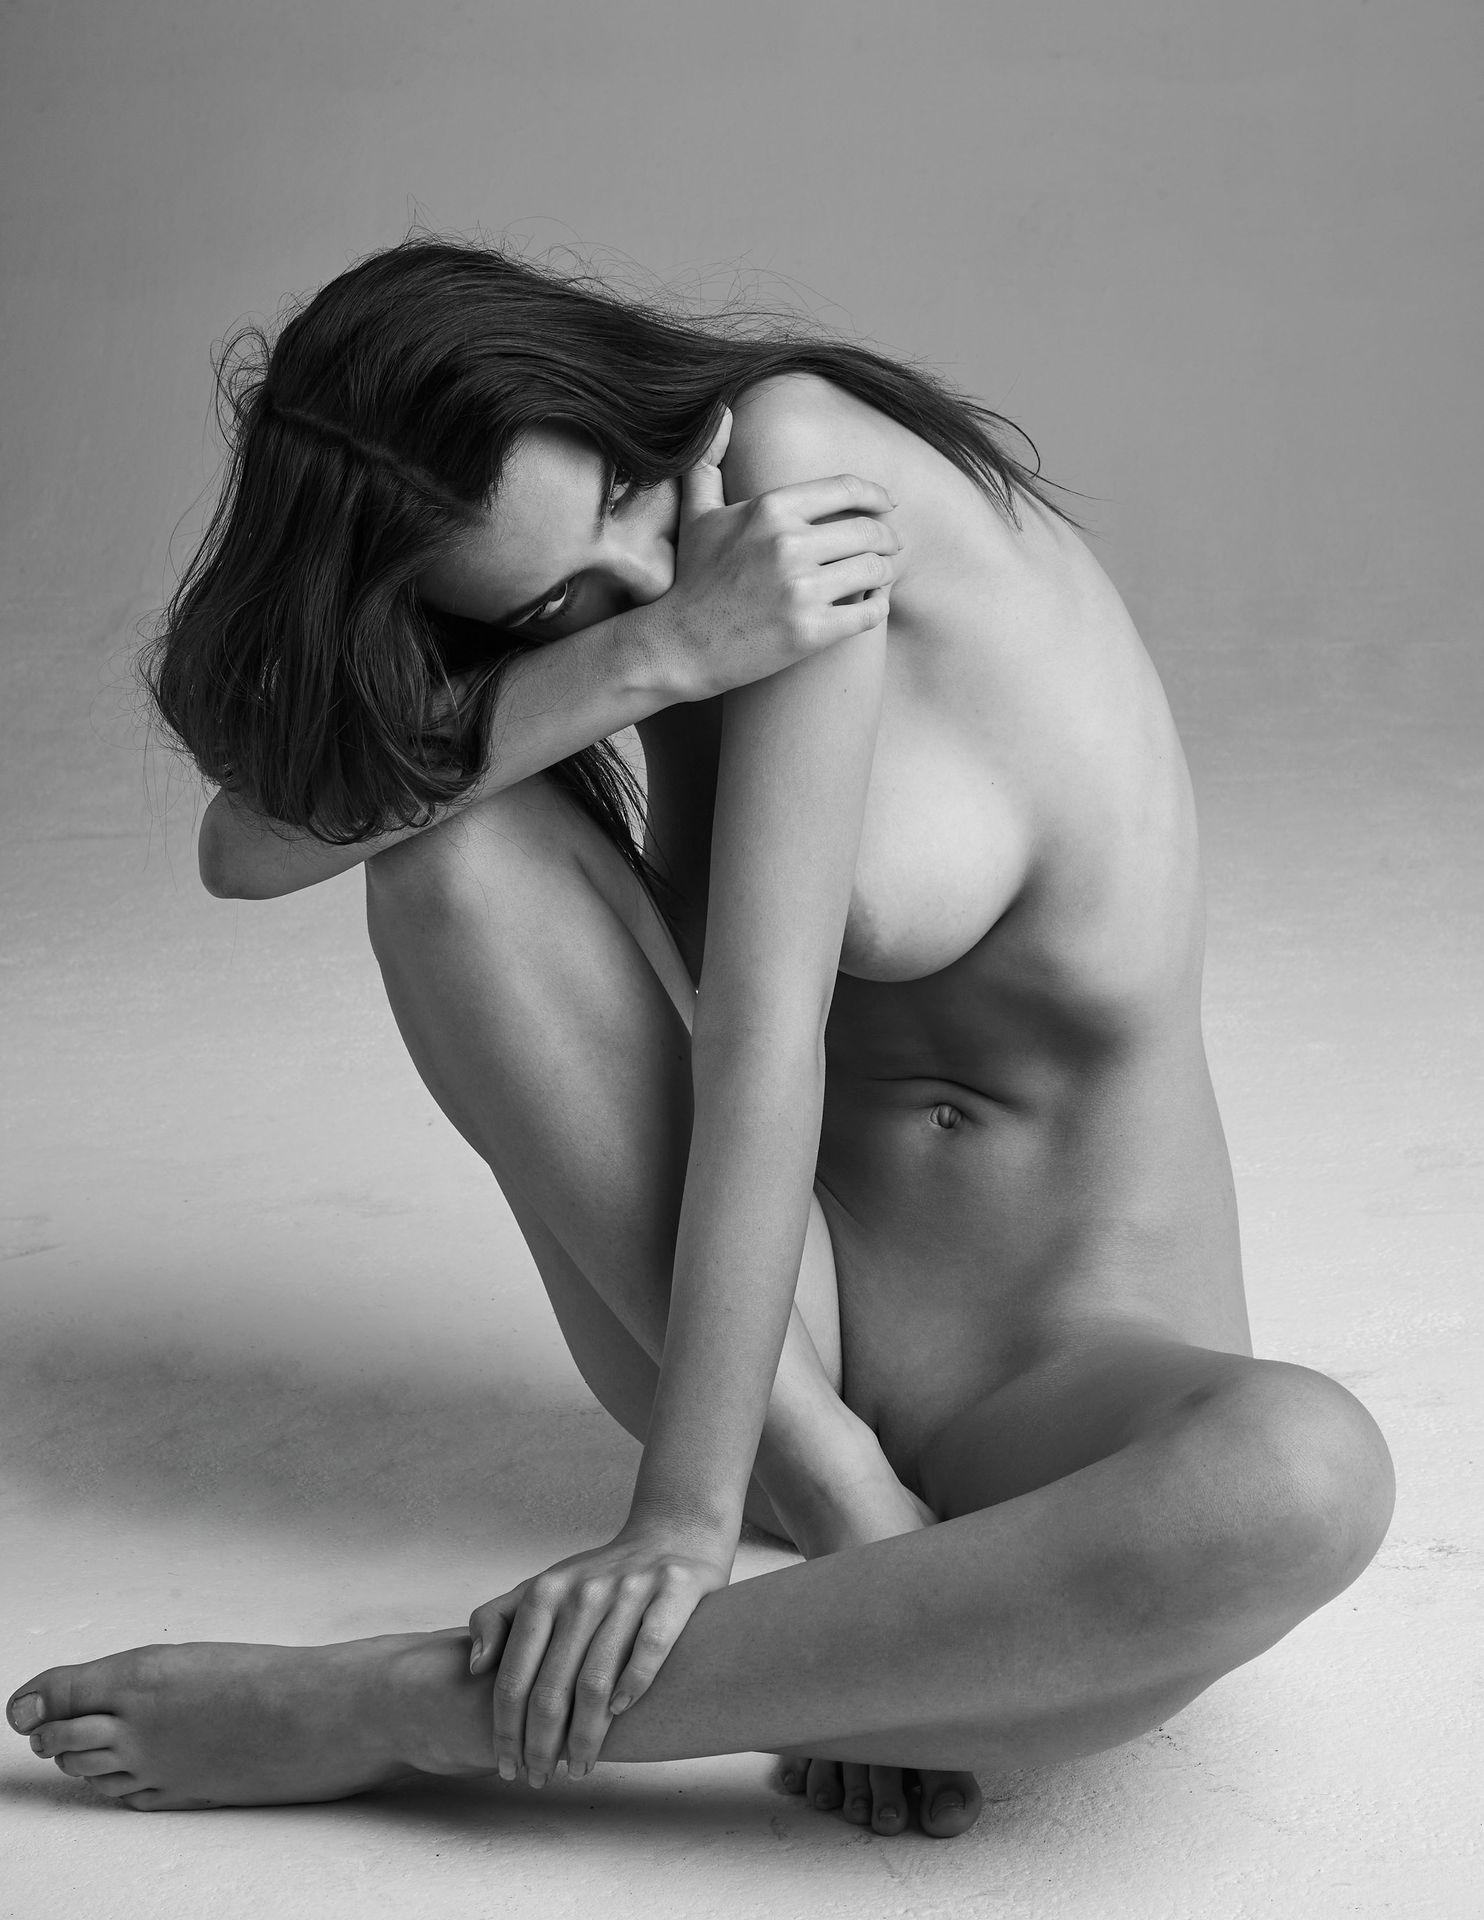 Emily-Ratajkowski-Nude-14-thefappeningblog.com_.jpg